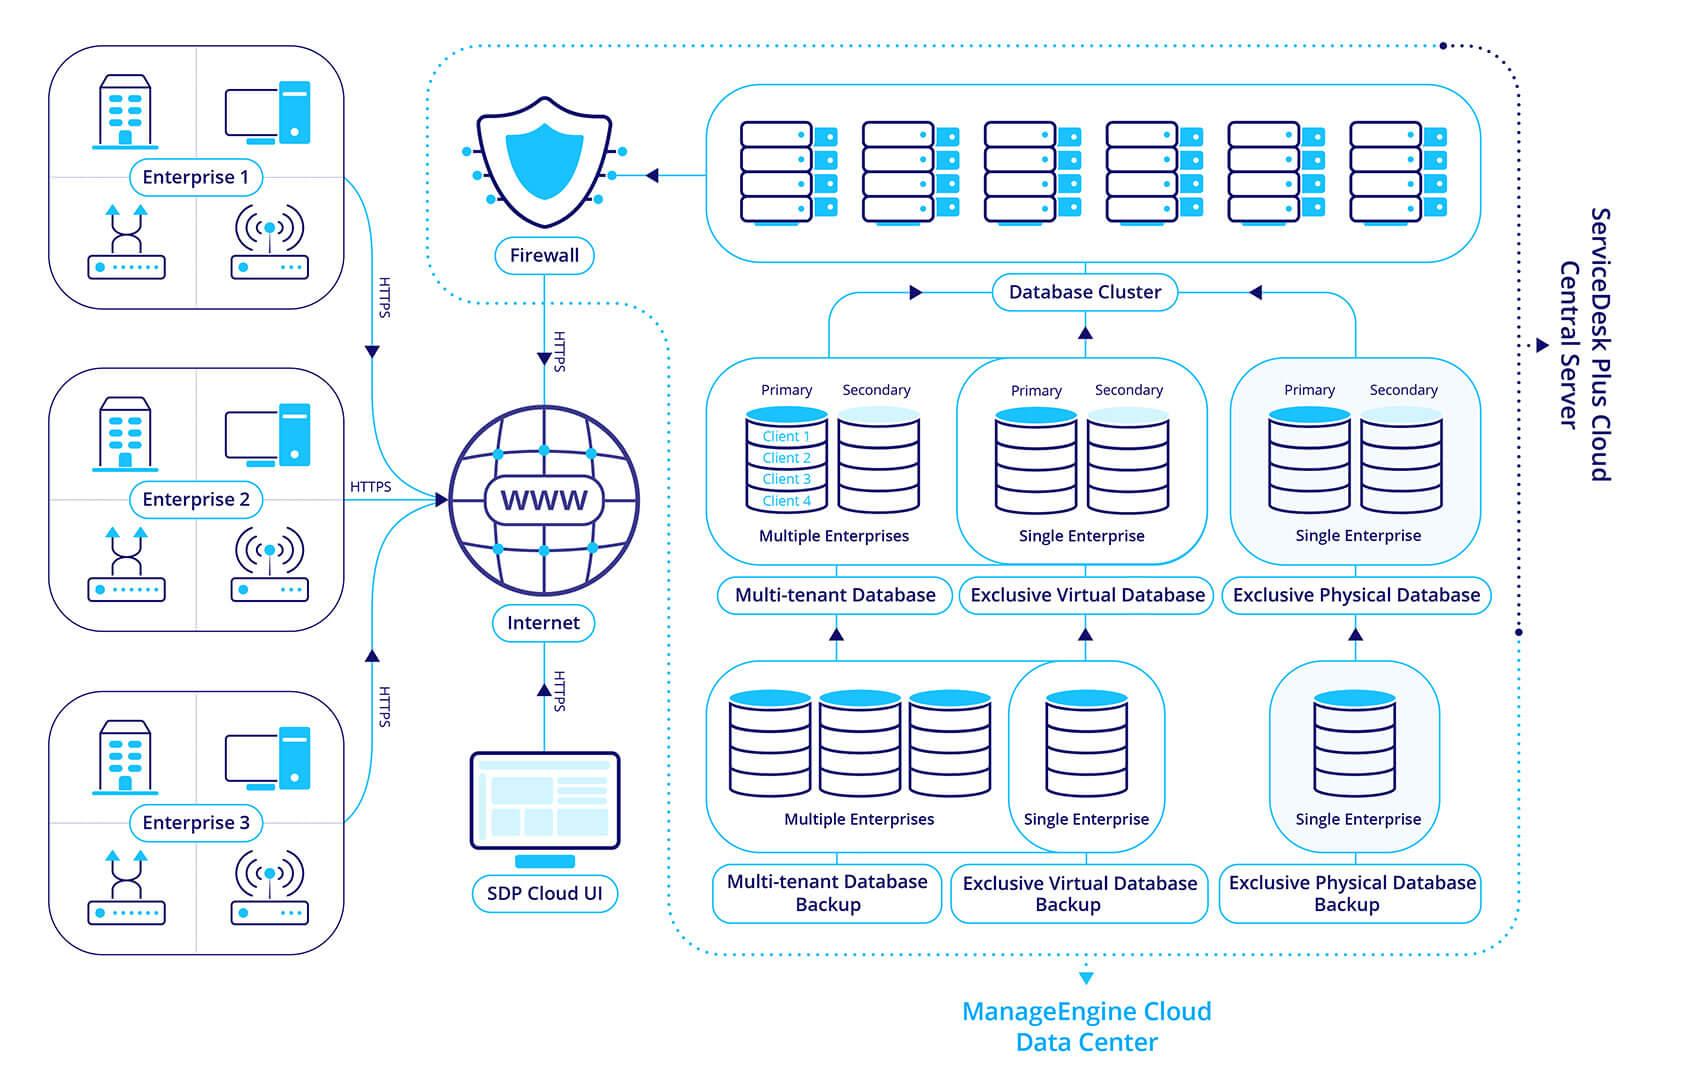 Enterprise service desk data storage architecture